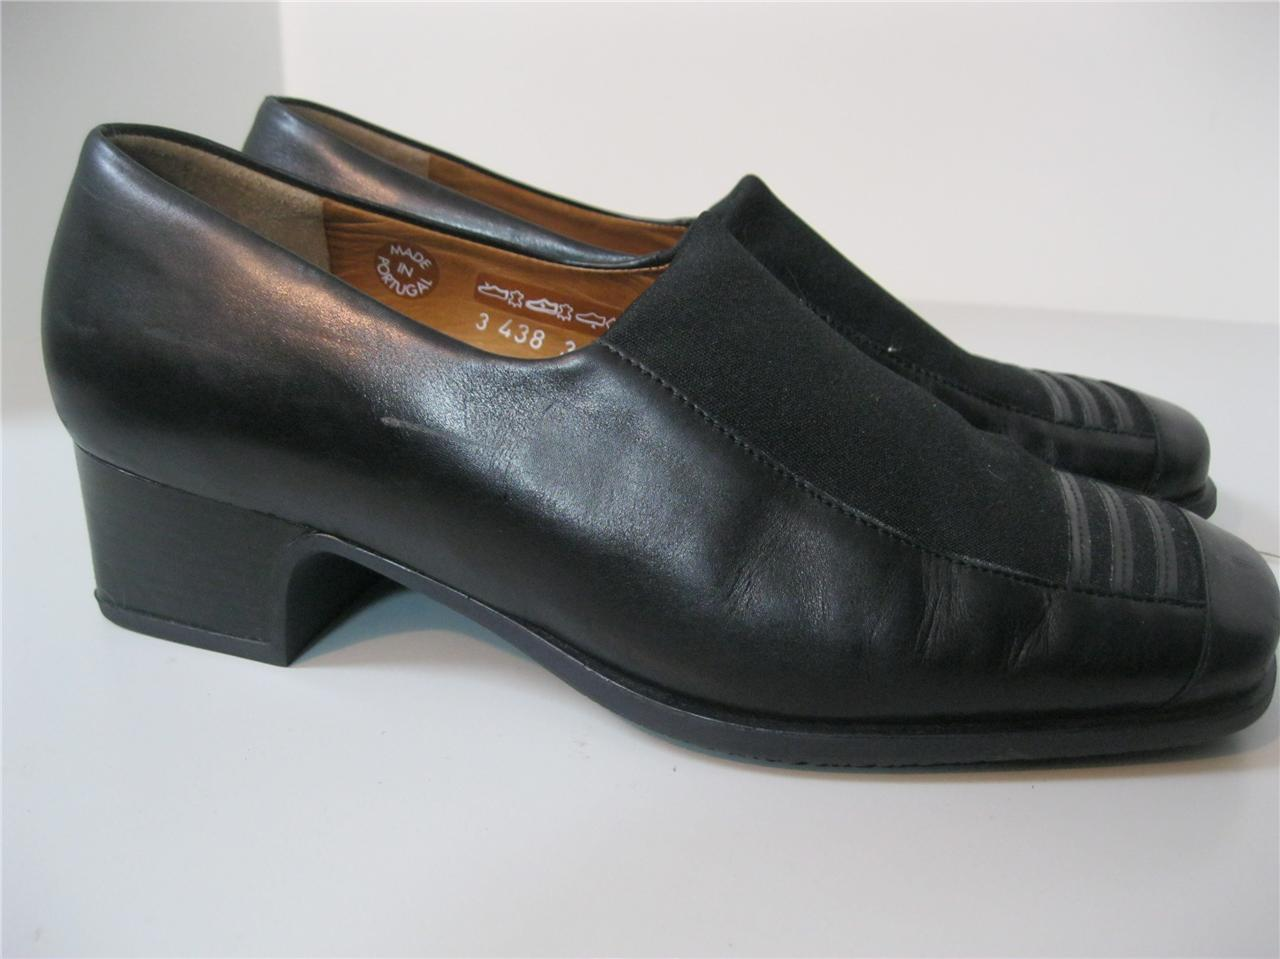 MEPHISTO-9-DRESS-LOAFERS-HEELS-WORK-BUSINESS-COMFORT-WOMEN-SHOES-BLACK